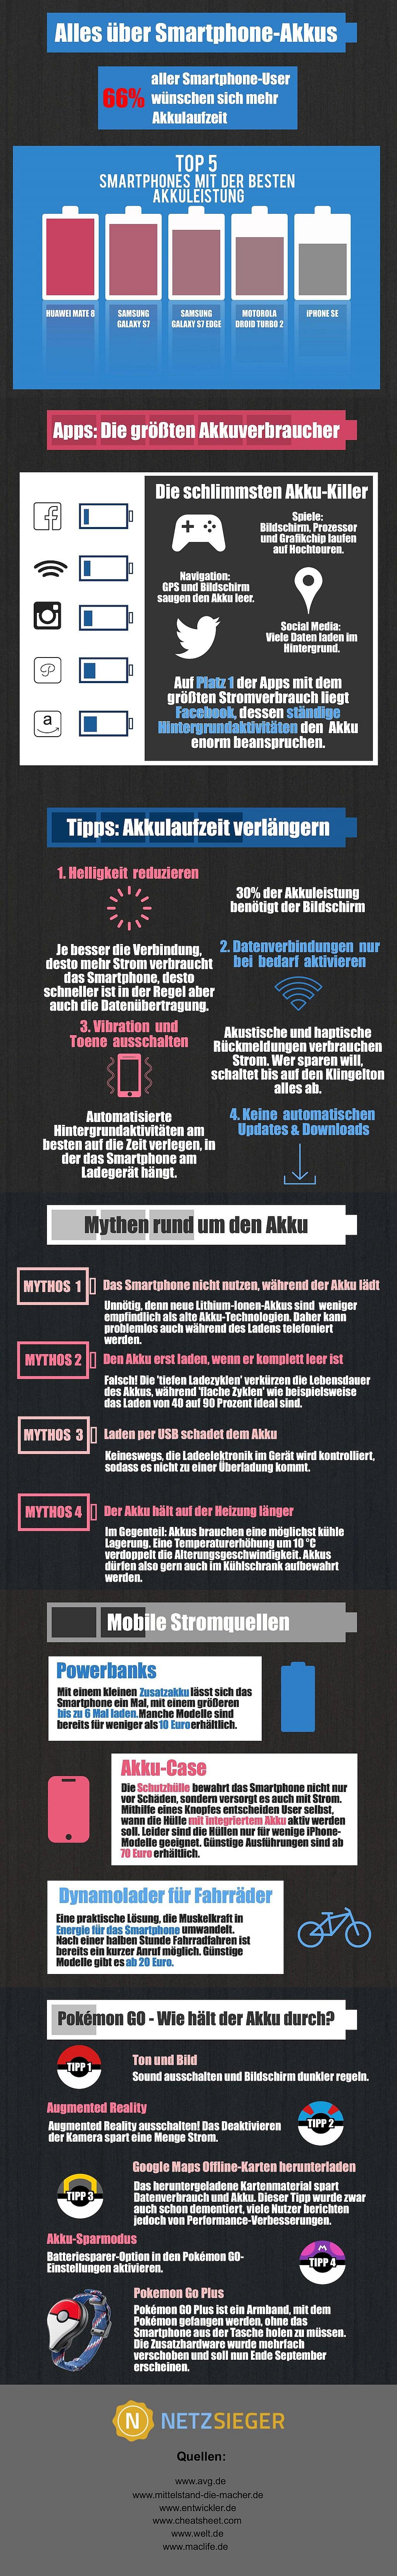 infografik netzsieger smartphones akkus